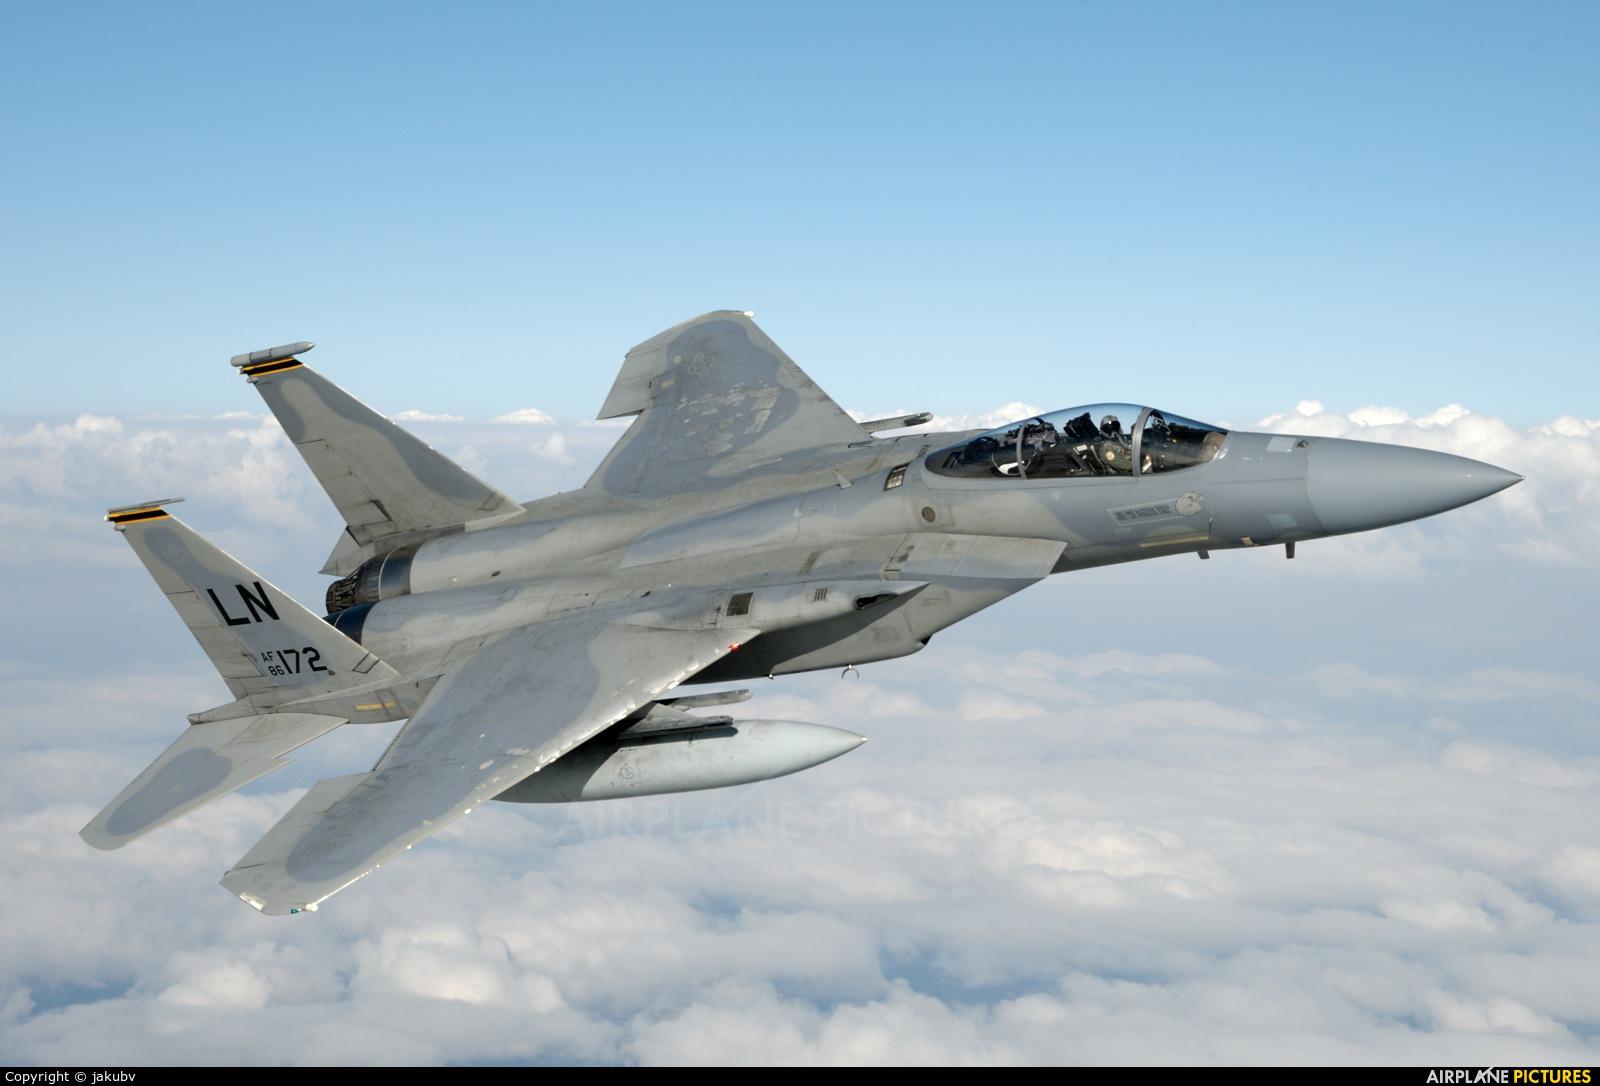 USA - Air Force 86-0172 aircraft at In Flight - England